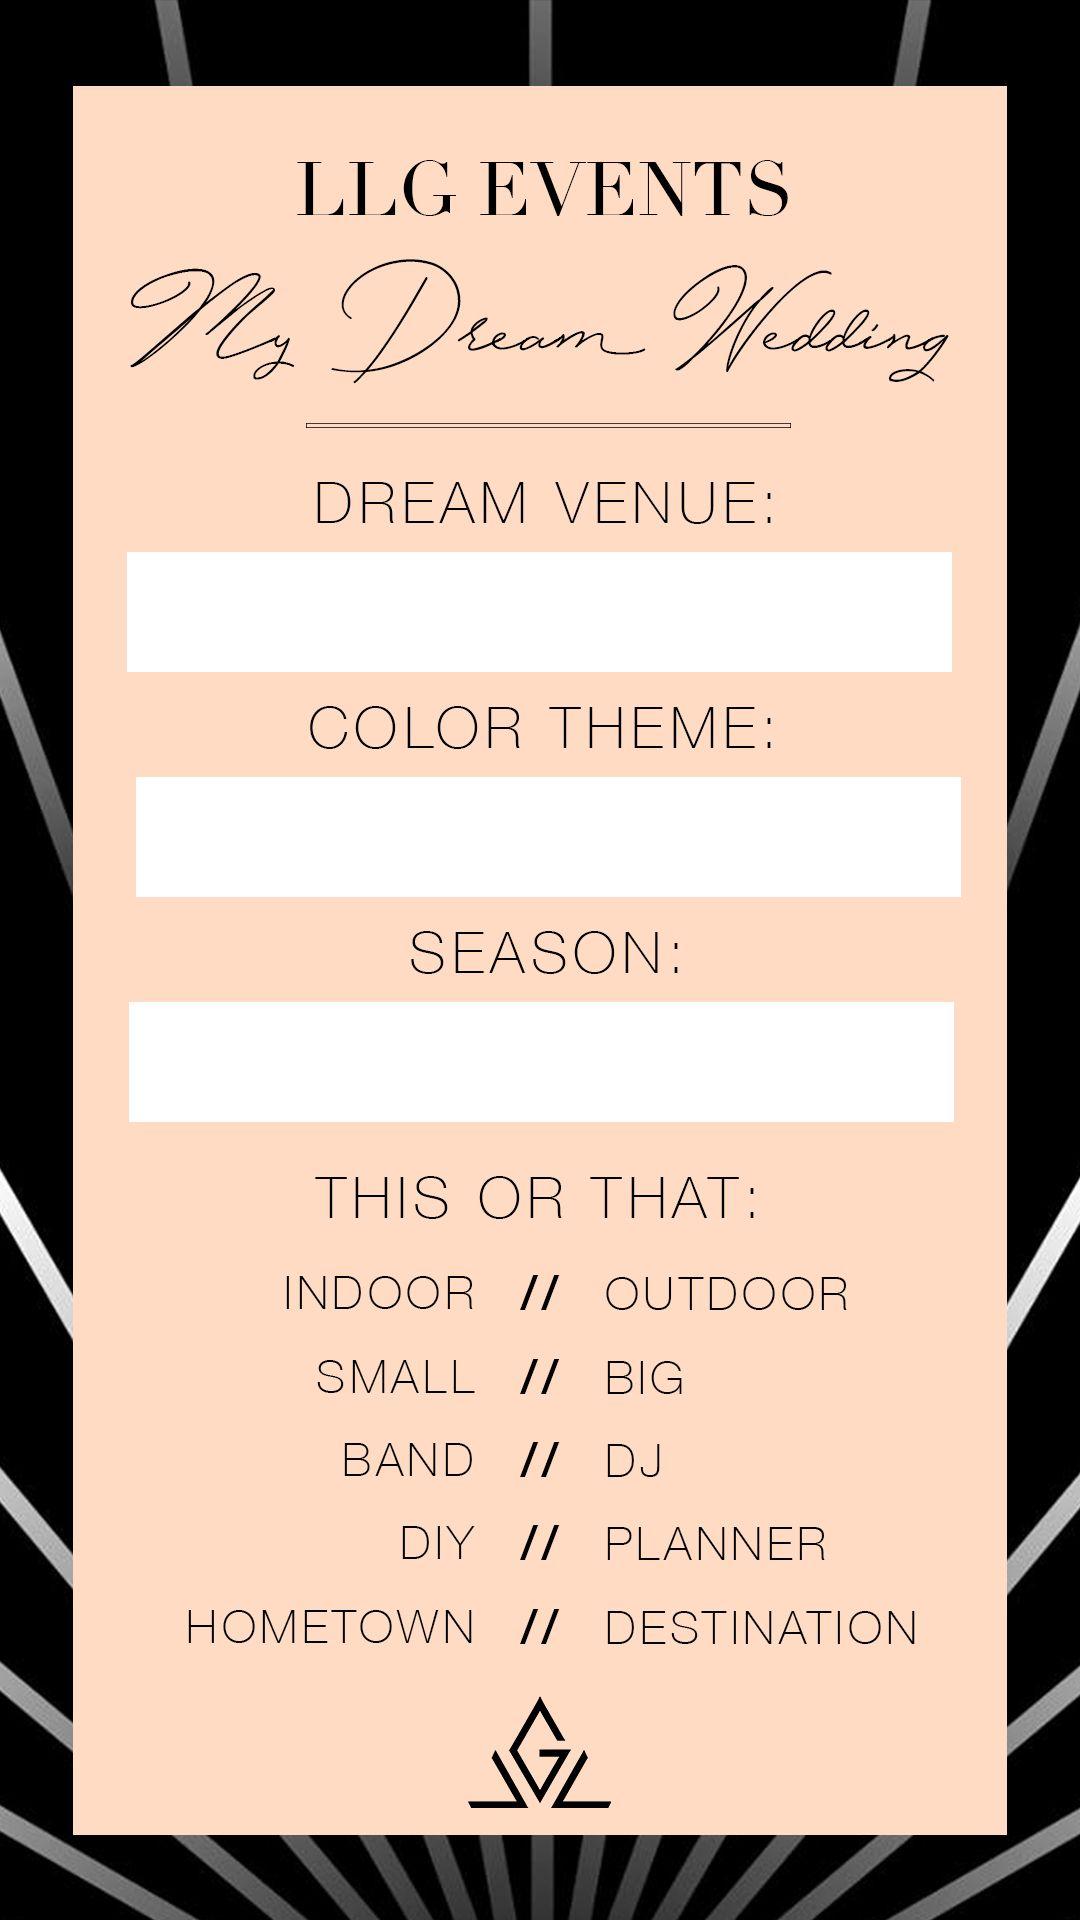 Instagram Story Dream Wedding Quiz Template By Llg Events In 2020 Wedding Quiz Luxury Wedding Planning Dream Wedding